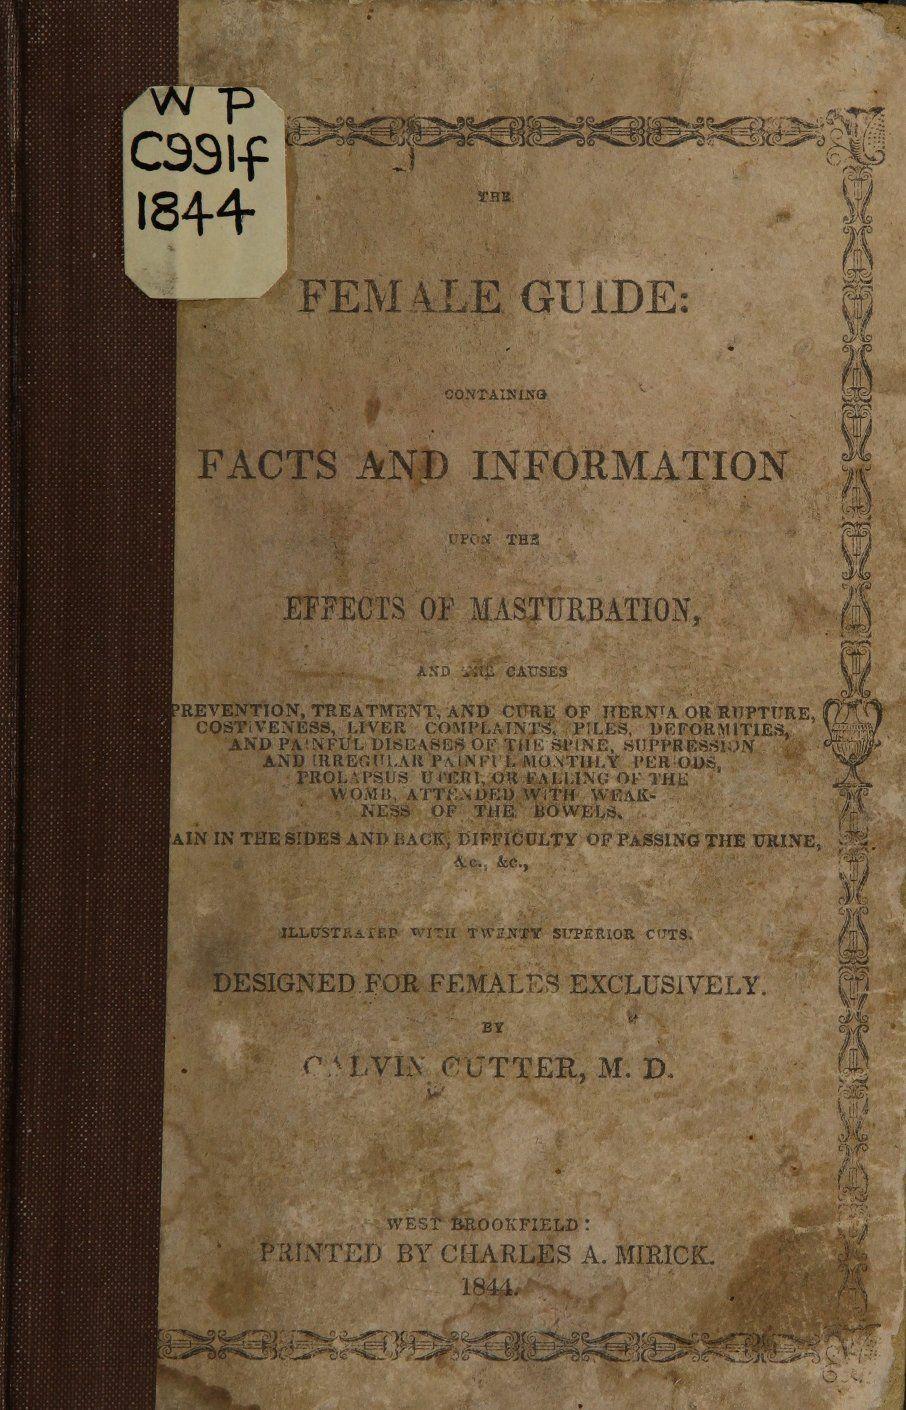 Female masturbation of History